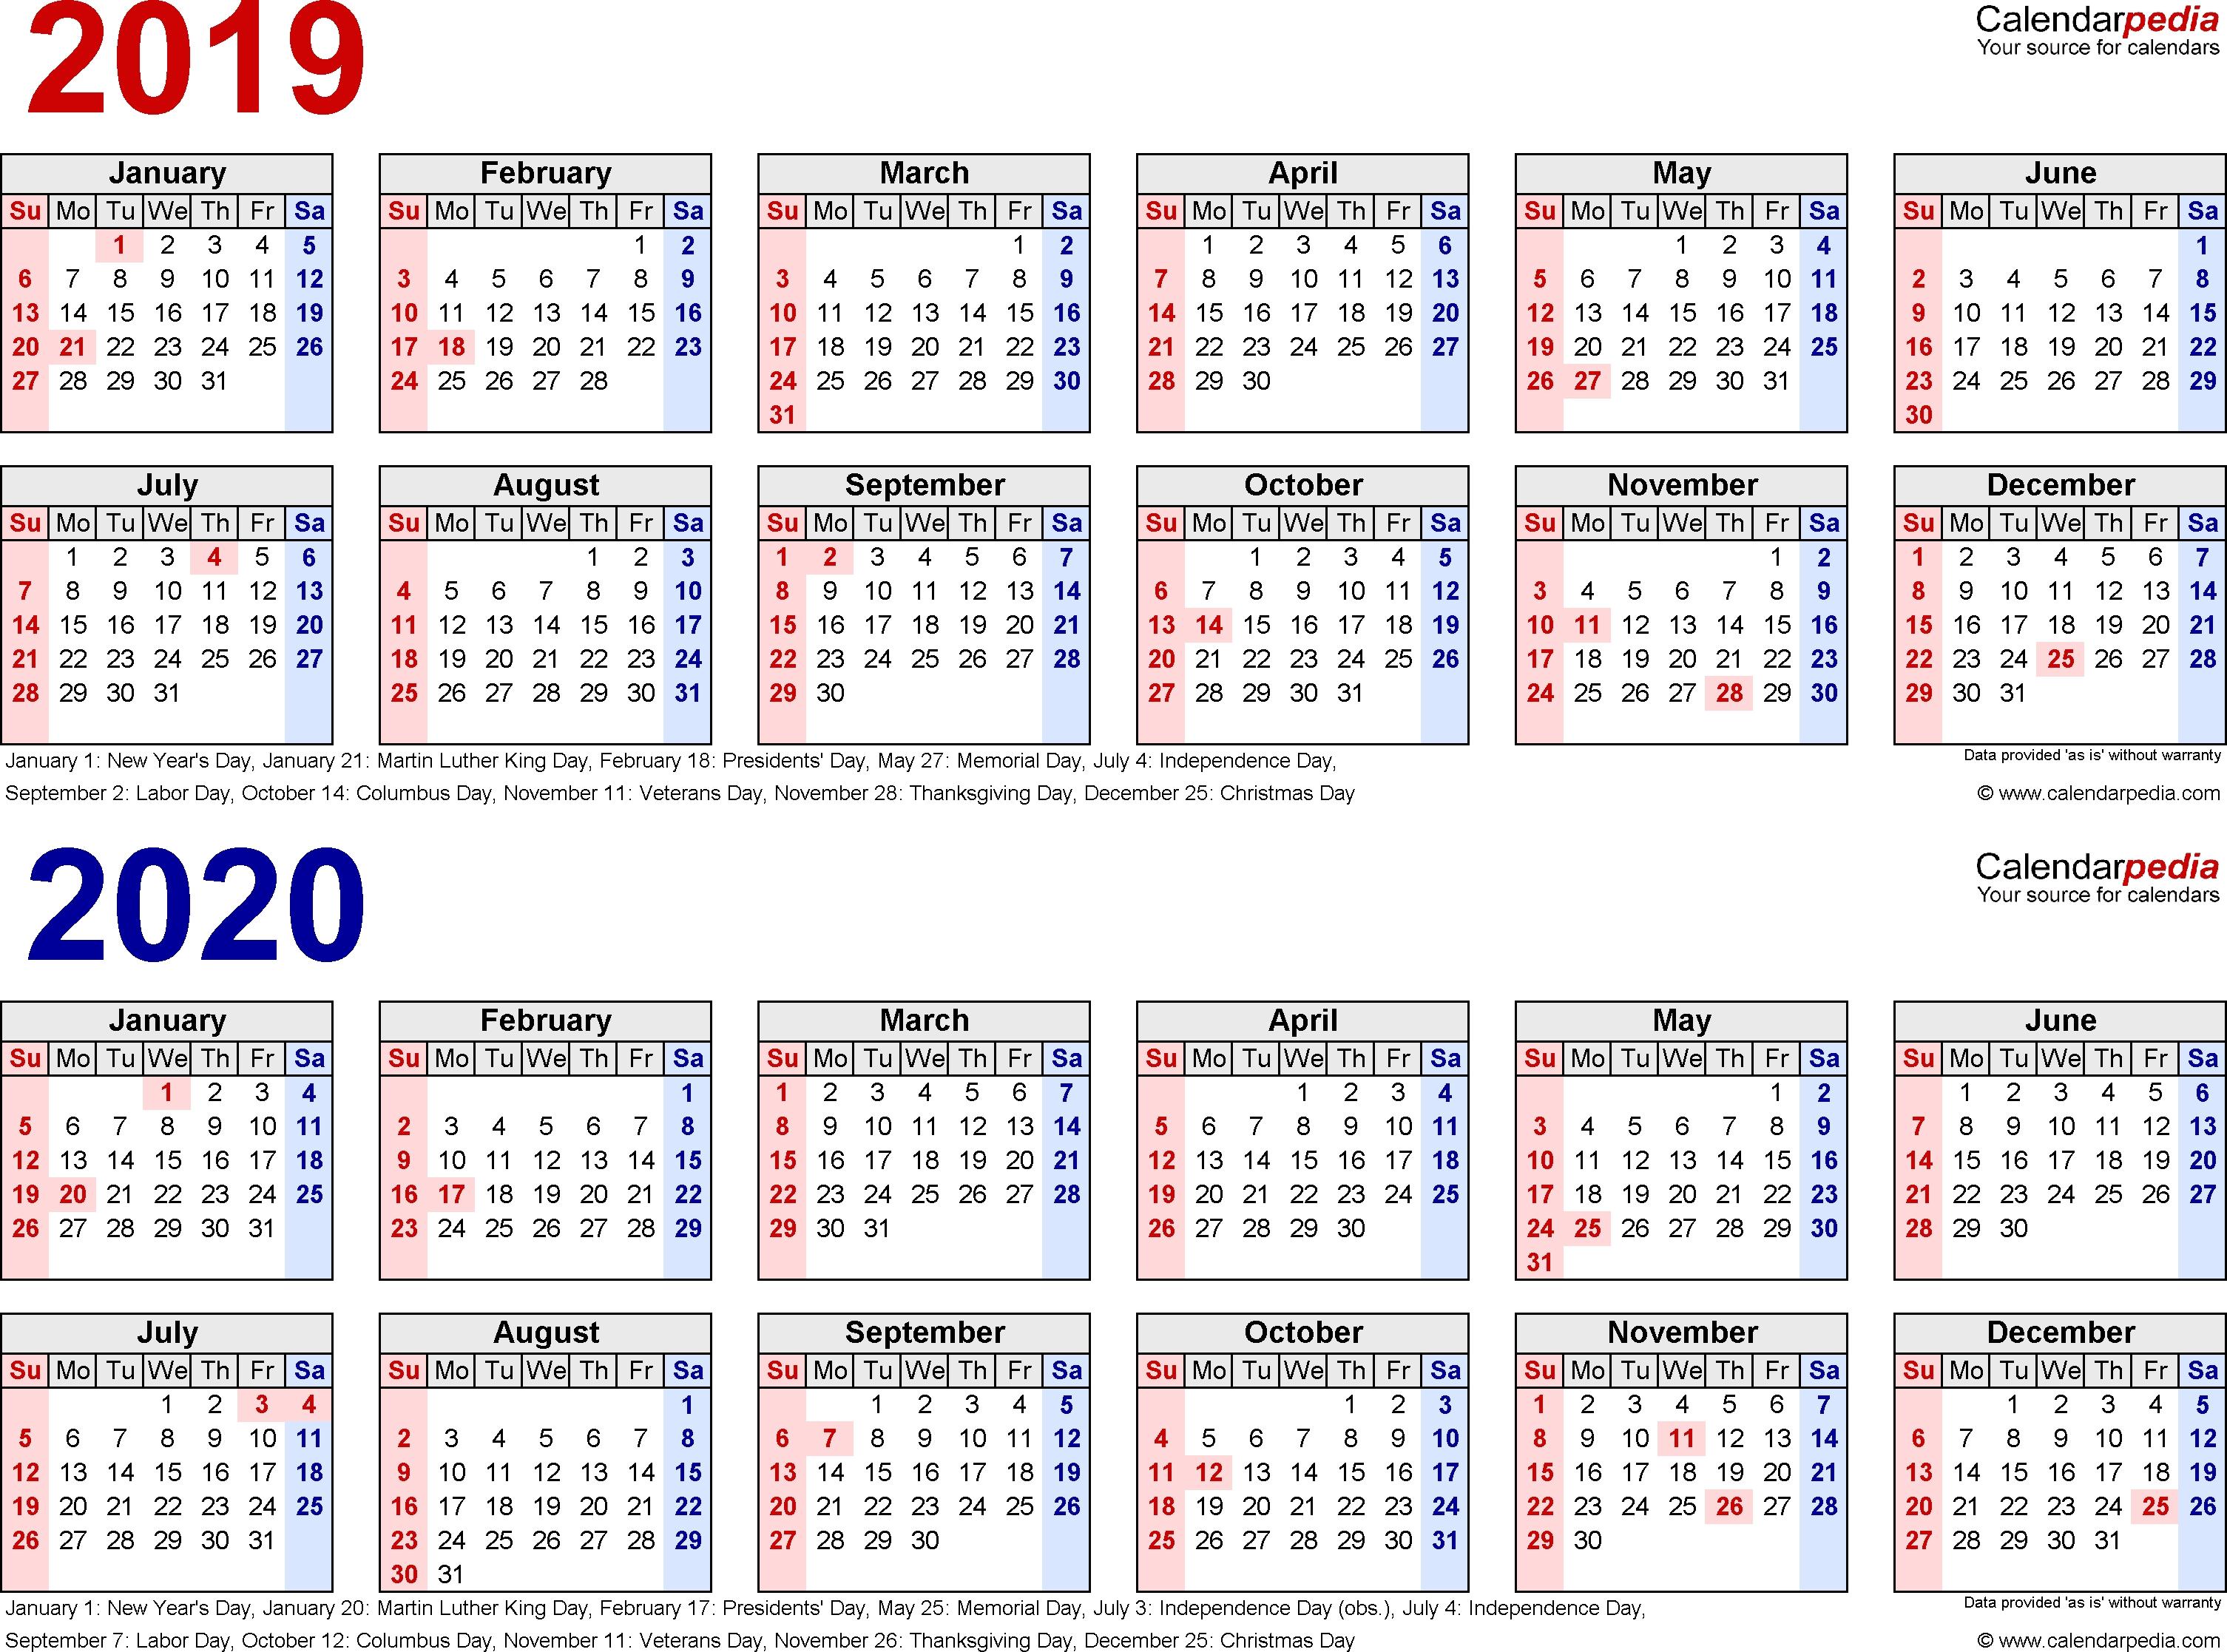 2019-2020 Calendar - Free Printable Two-Year Pdf Calendars_Blank Calendar 2020 12 Month